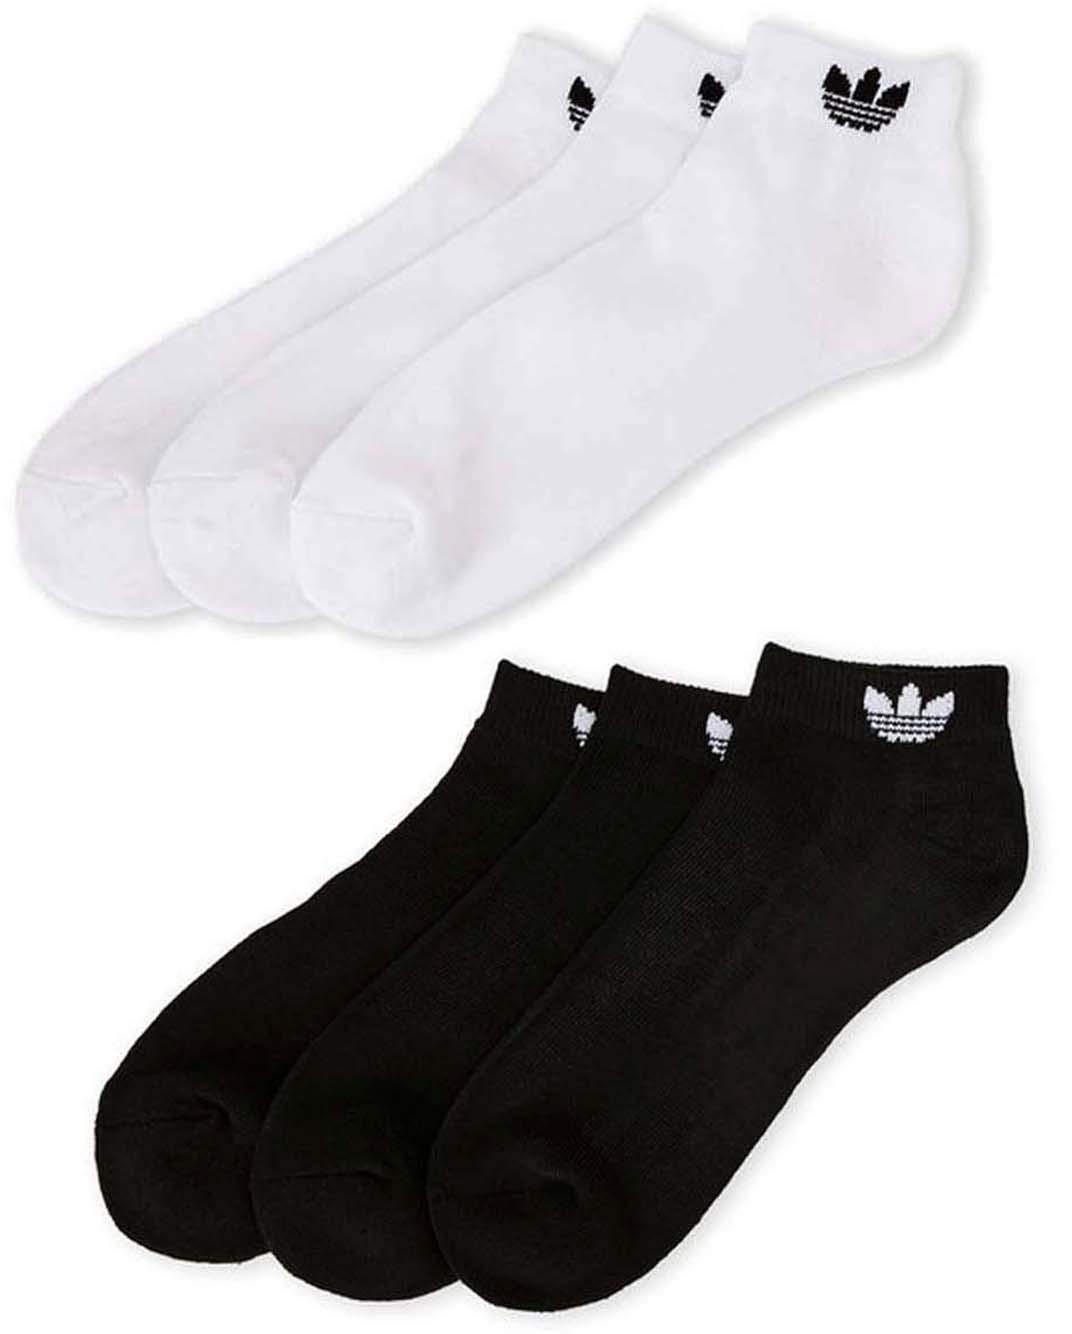 adidas Men's Athletic Low Cut Sock (6-Pack) Black/White Originals by adidas